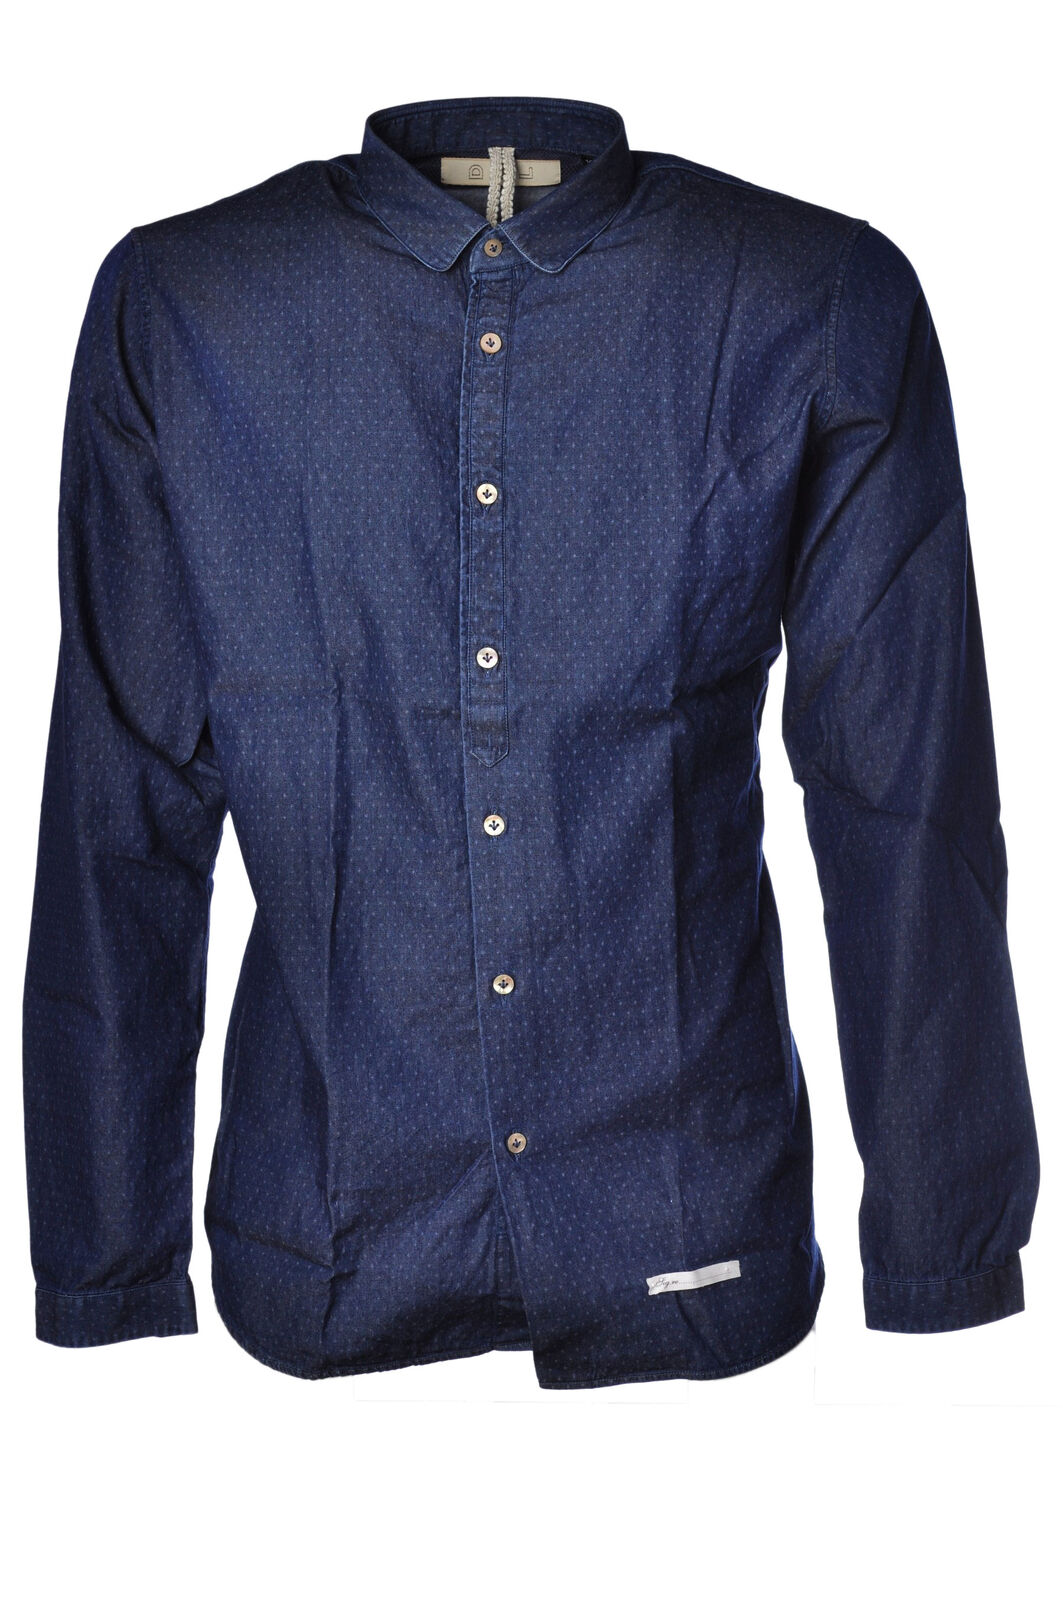 Dnl - Shirts-Shirt - Man - Blau - 996718C181052